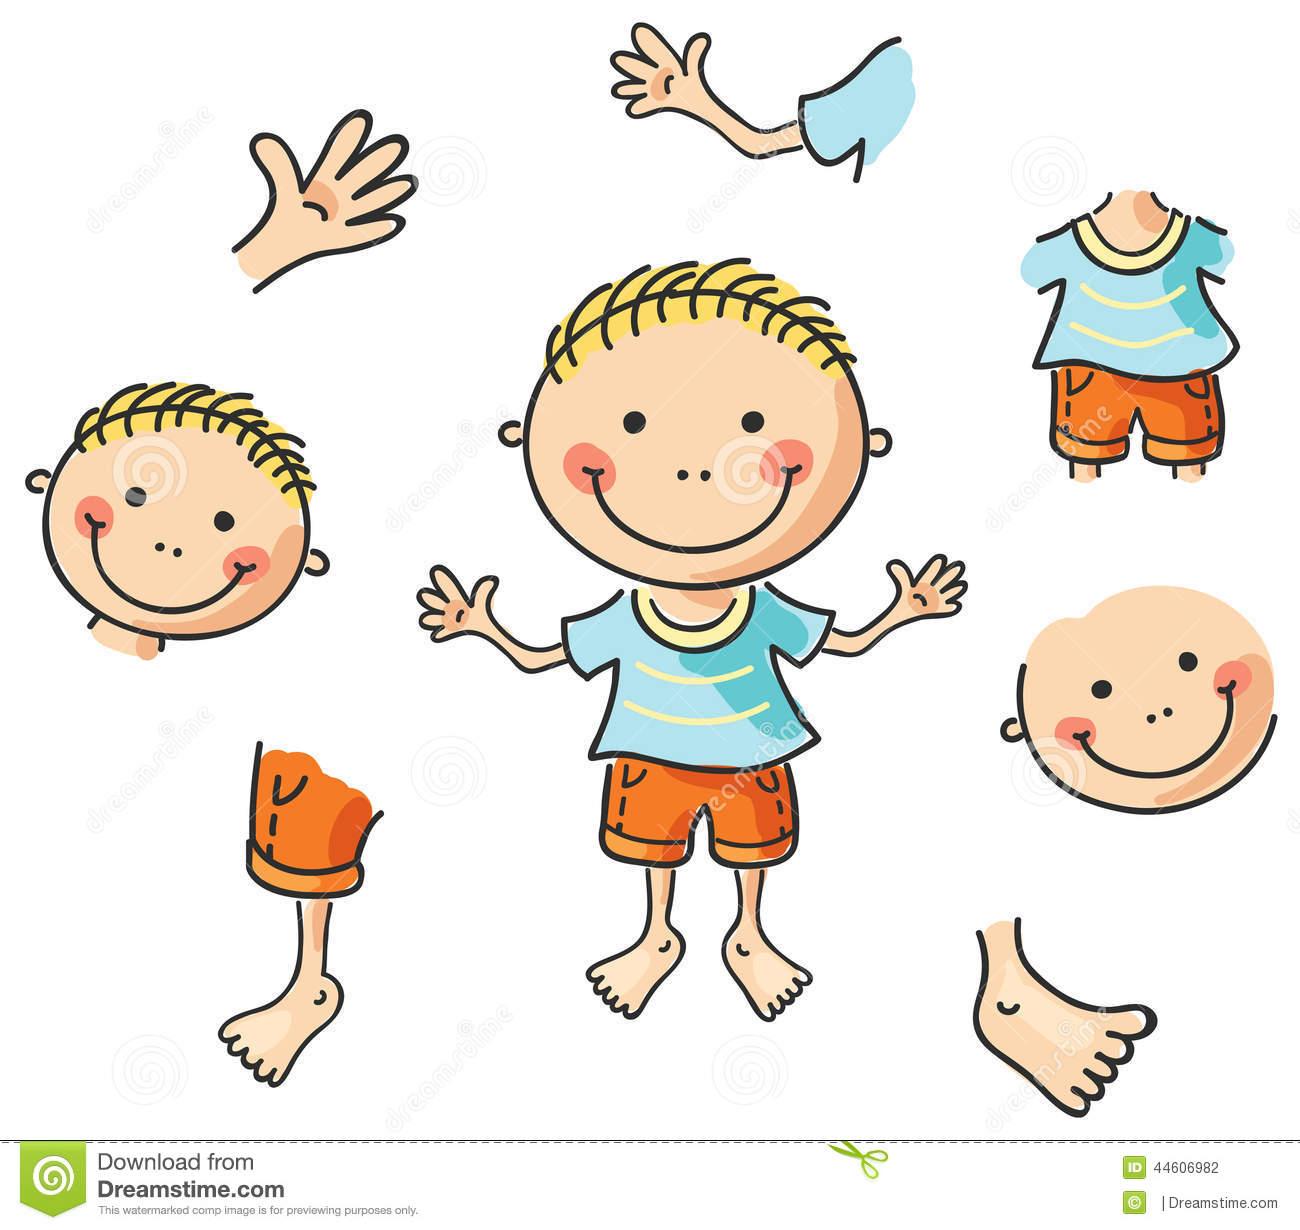 Organs clipart child body Art Body children 73 Clipart